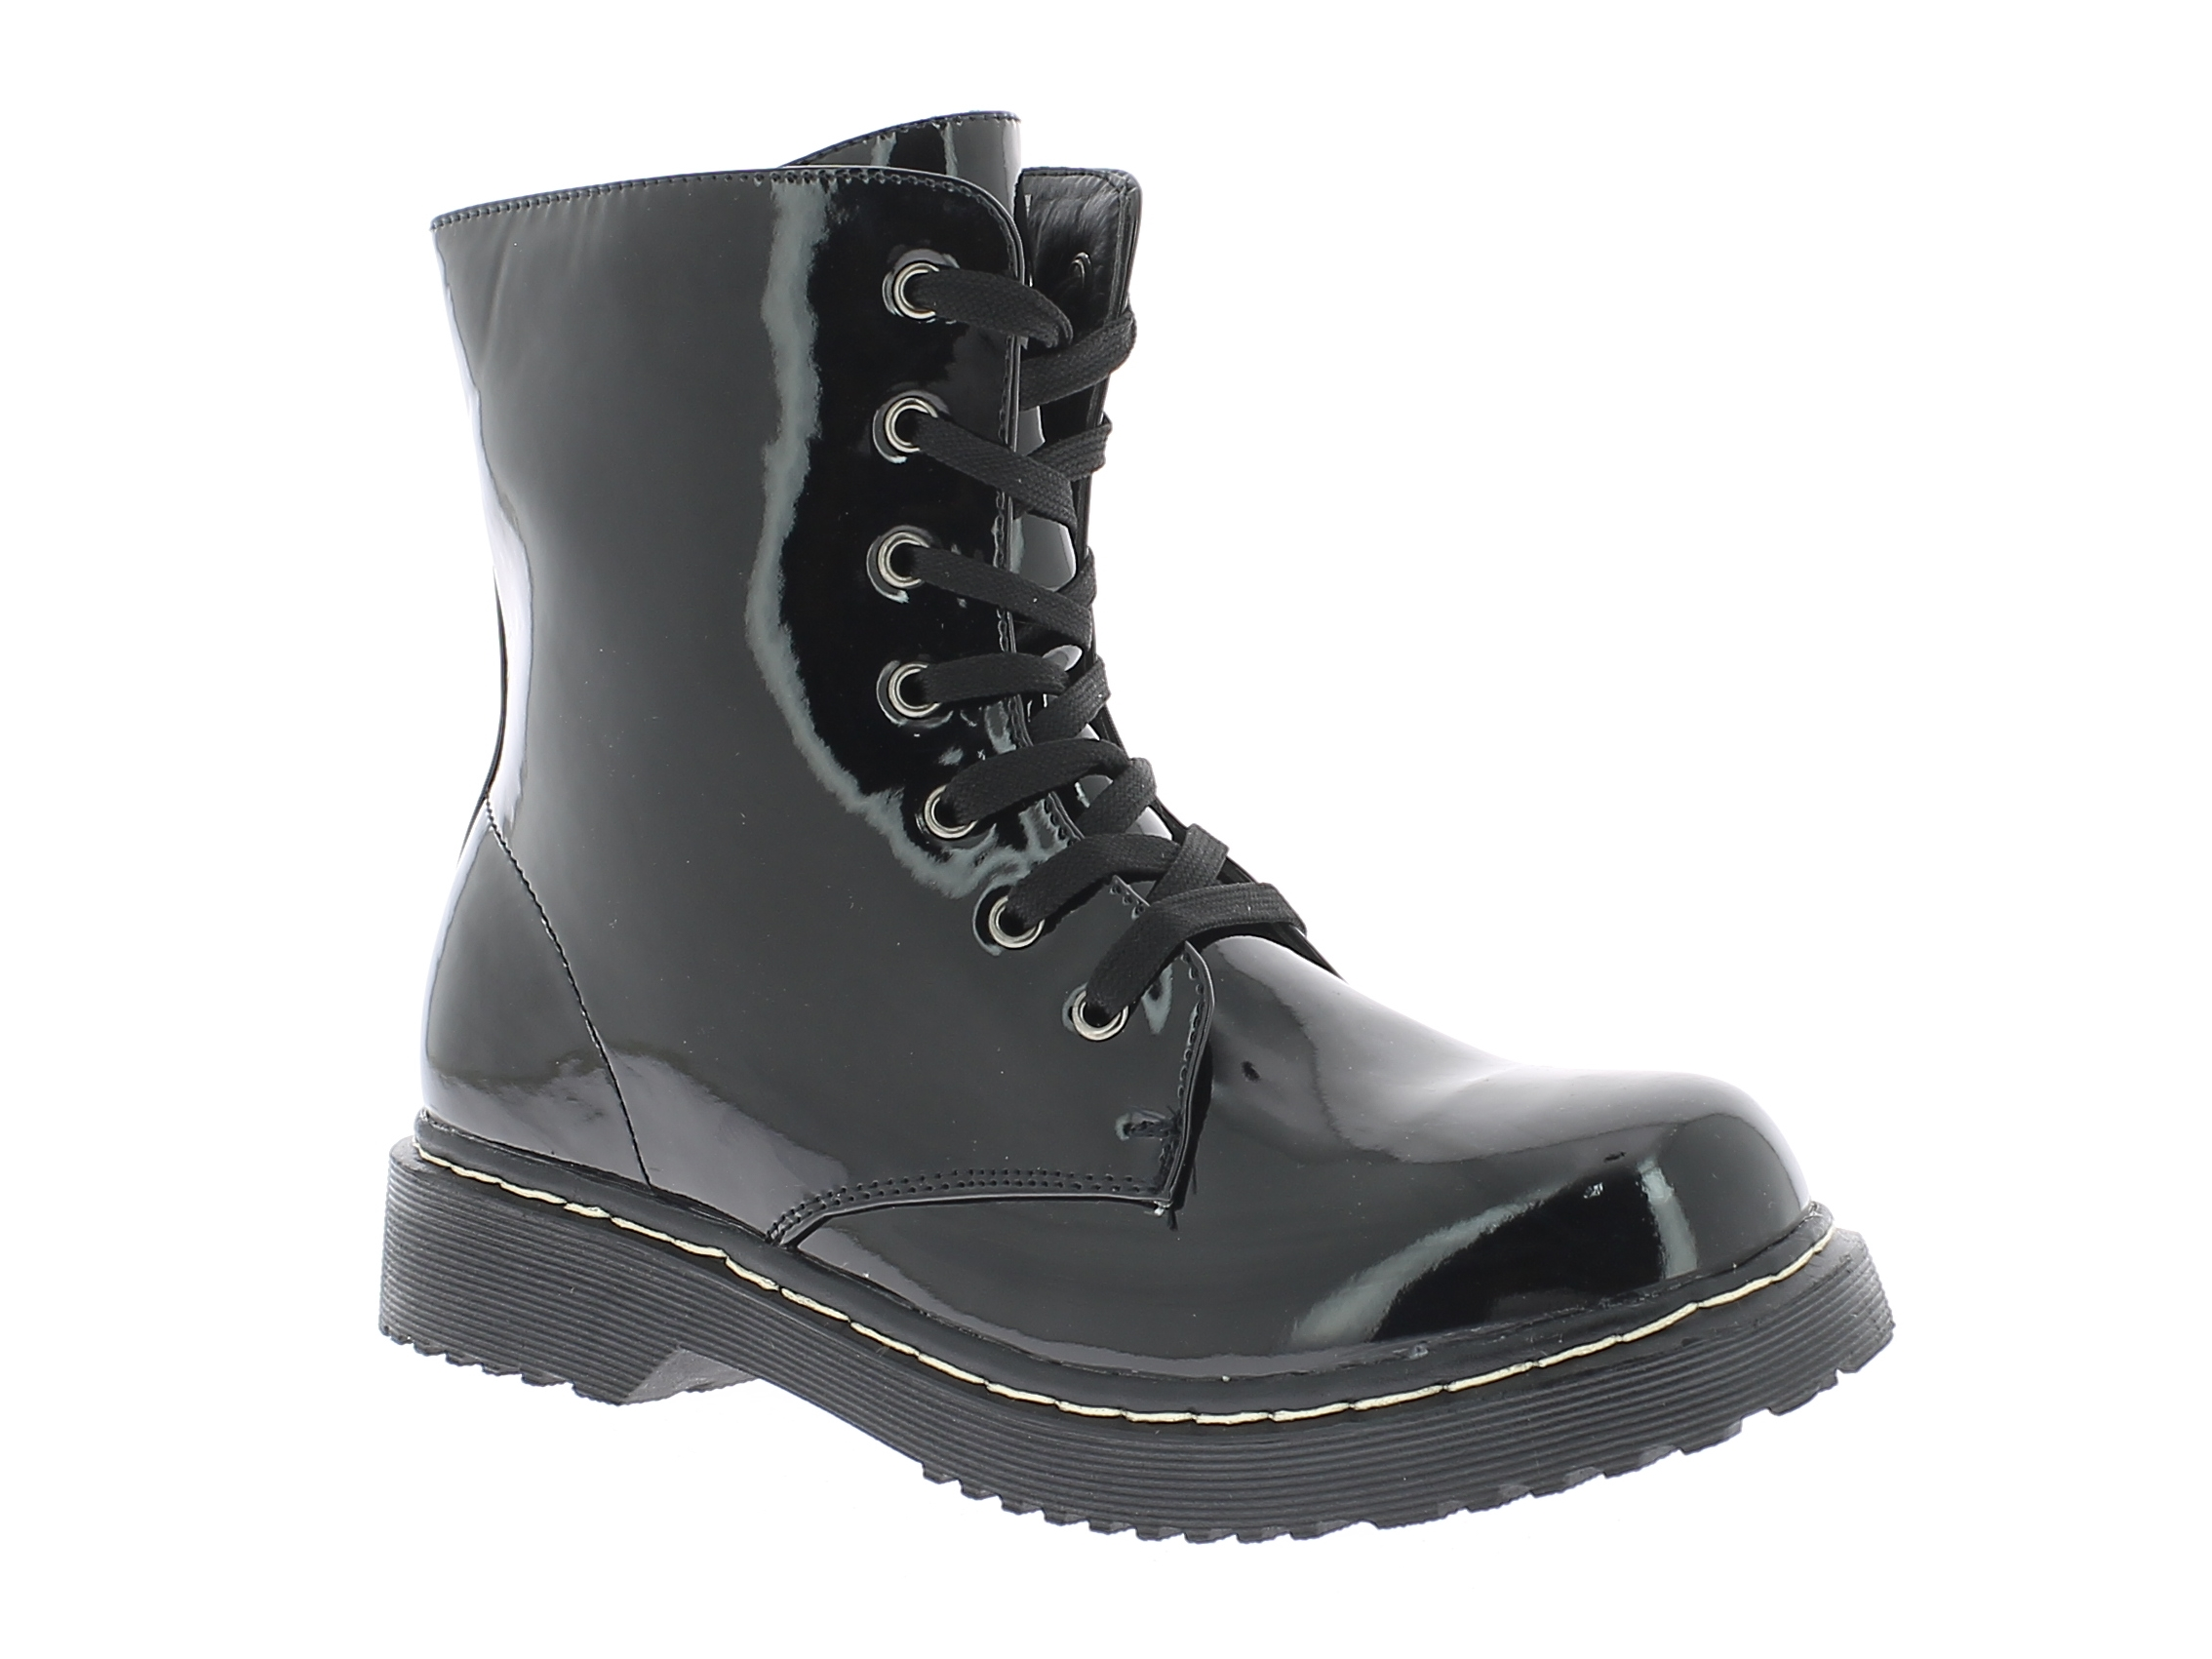 TOPWAY Γυναικείο Μποτάκι B073681 Μαύρο - IqShoes - B073681 BLACK black 36/1/15/7 παπούτσια  γυναικεία μποτάκια